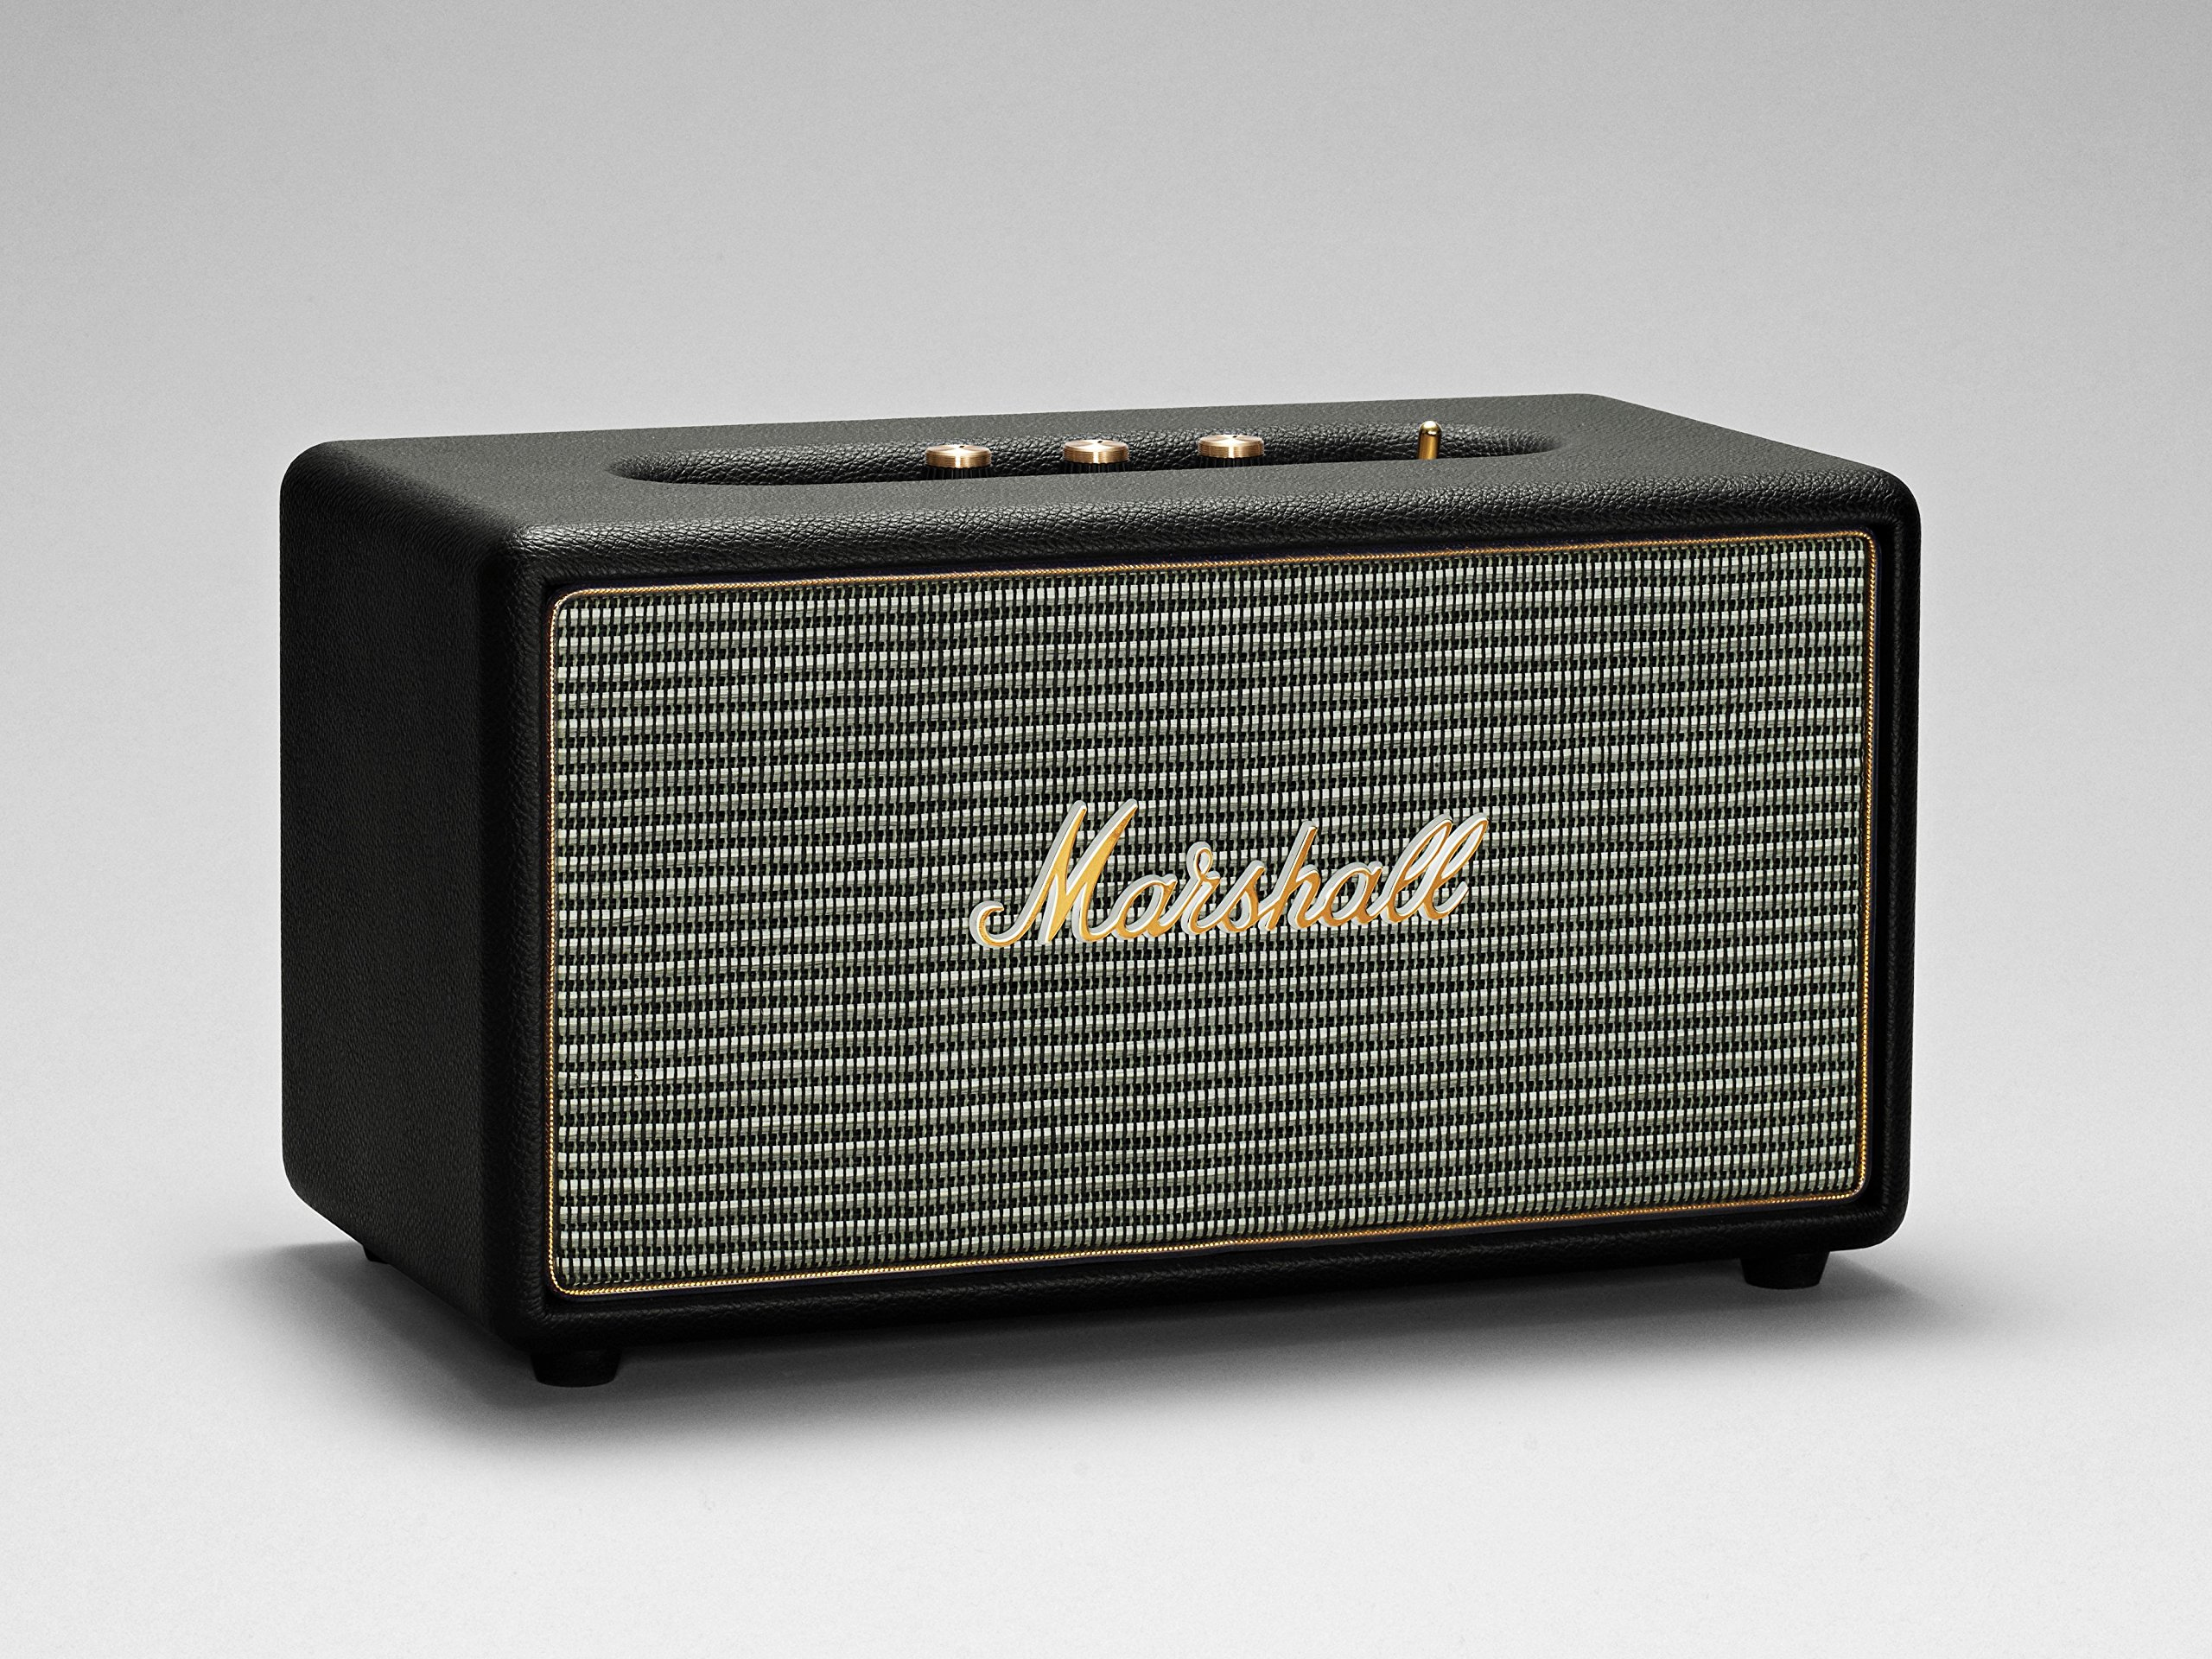 Marshall Stanmore Bluetooth Speaker, Black (04091627) by Marshall (Image #5)